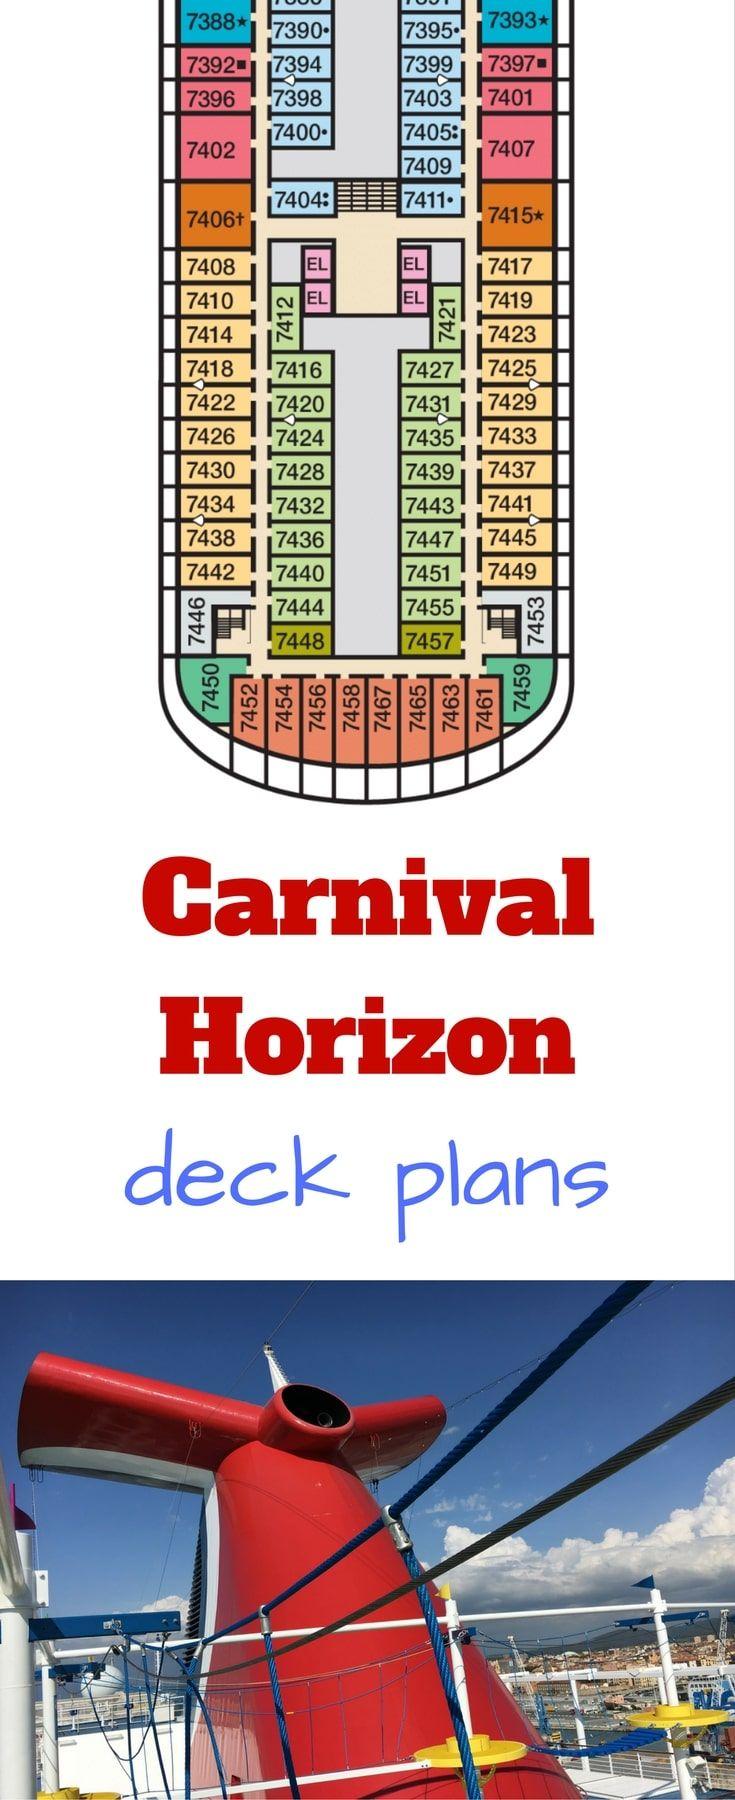 carnival horizon deck plans in 2018 carnival cruise line